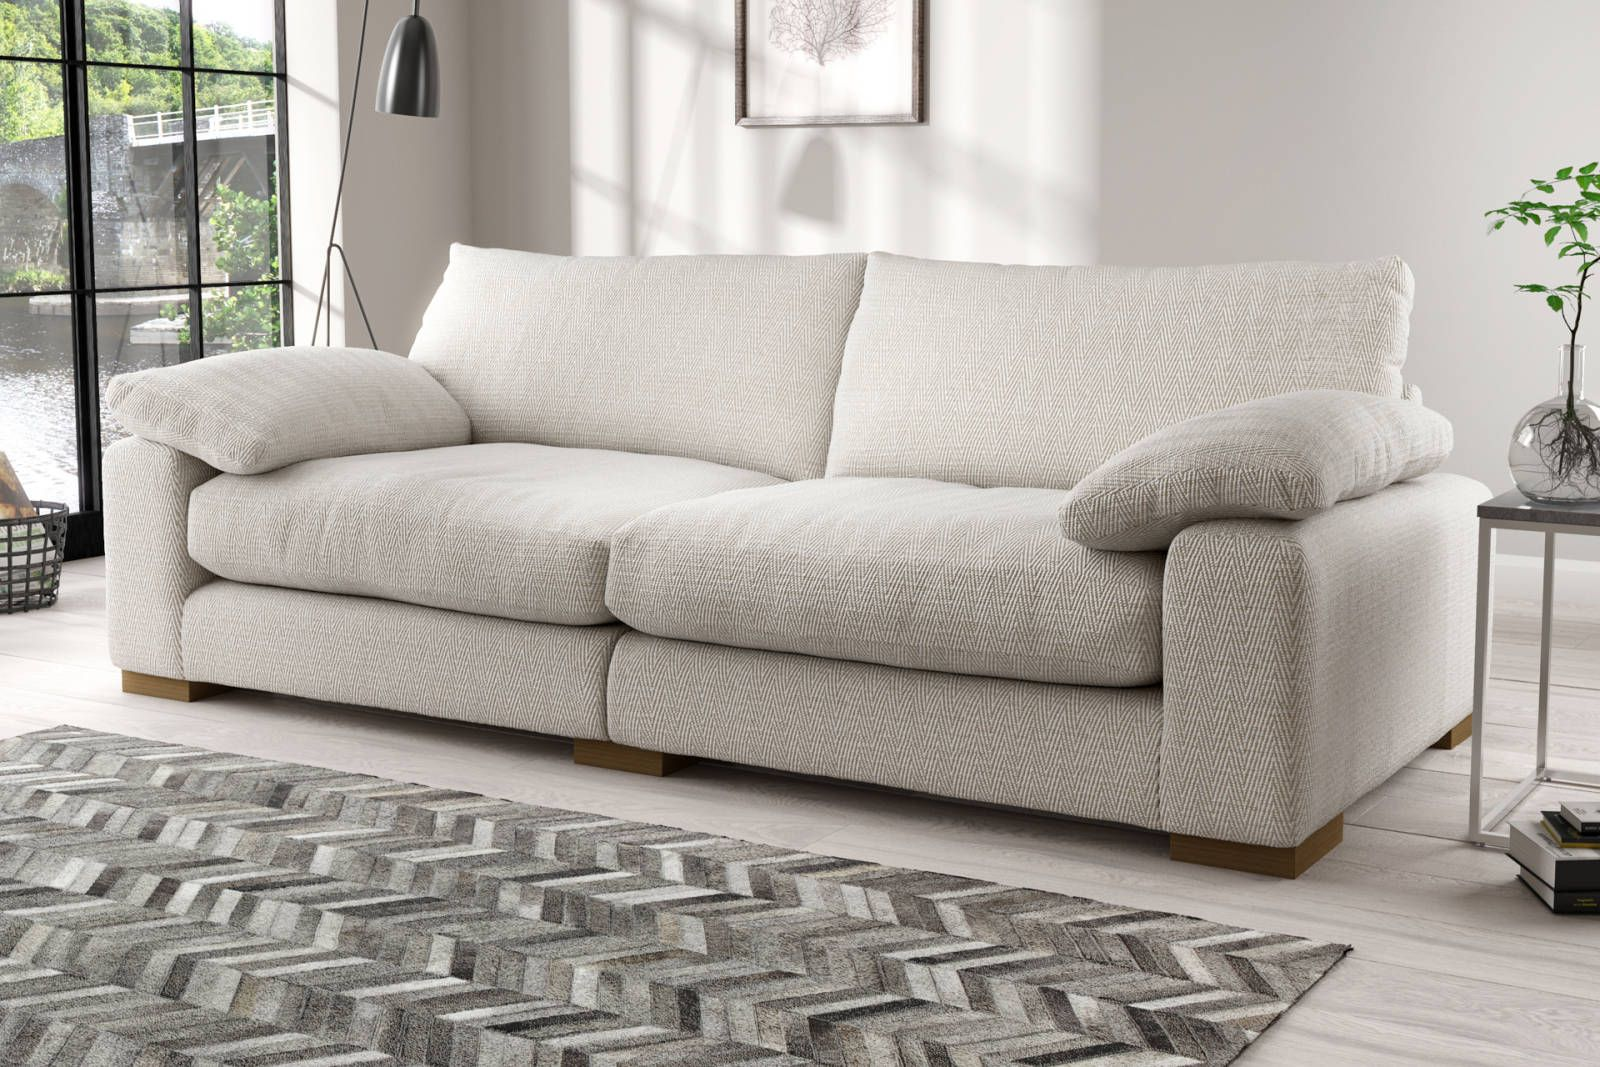 Benita 4 Seater Sofa Dfs Mott House In 2019 Sofa Living Room